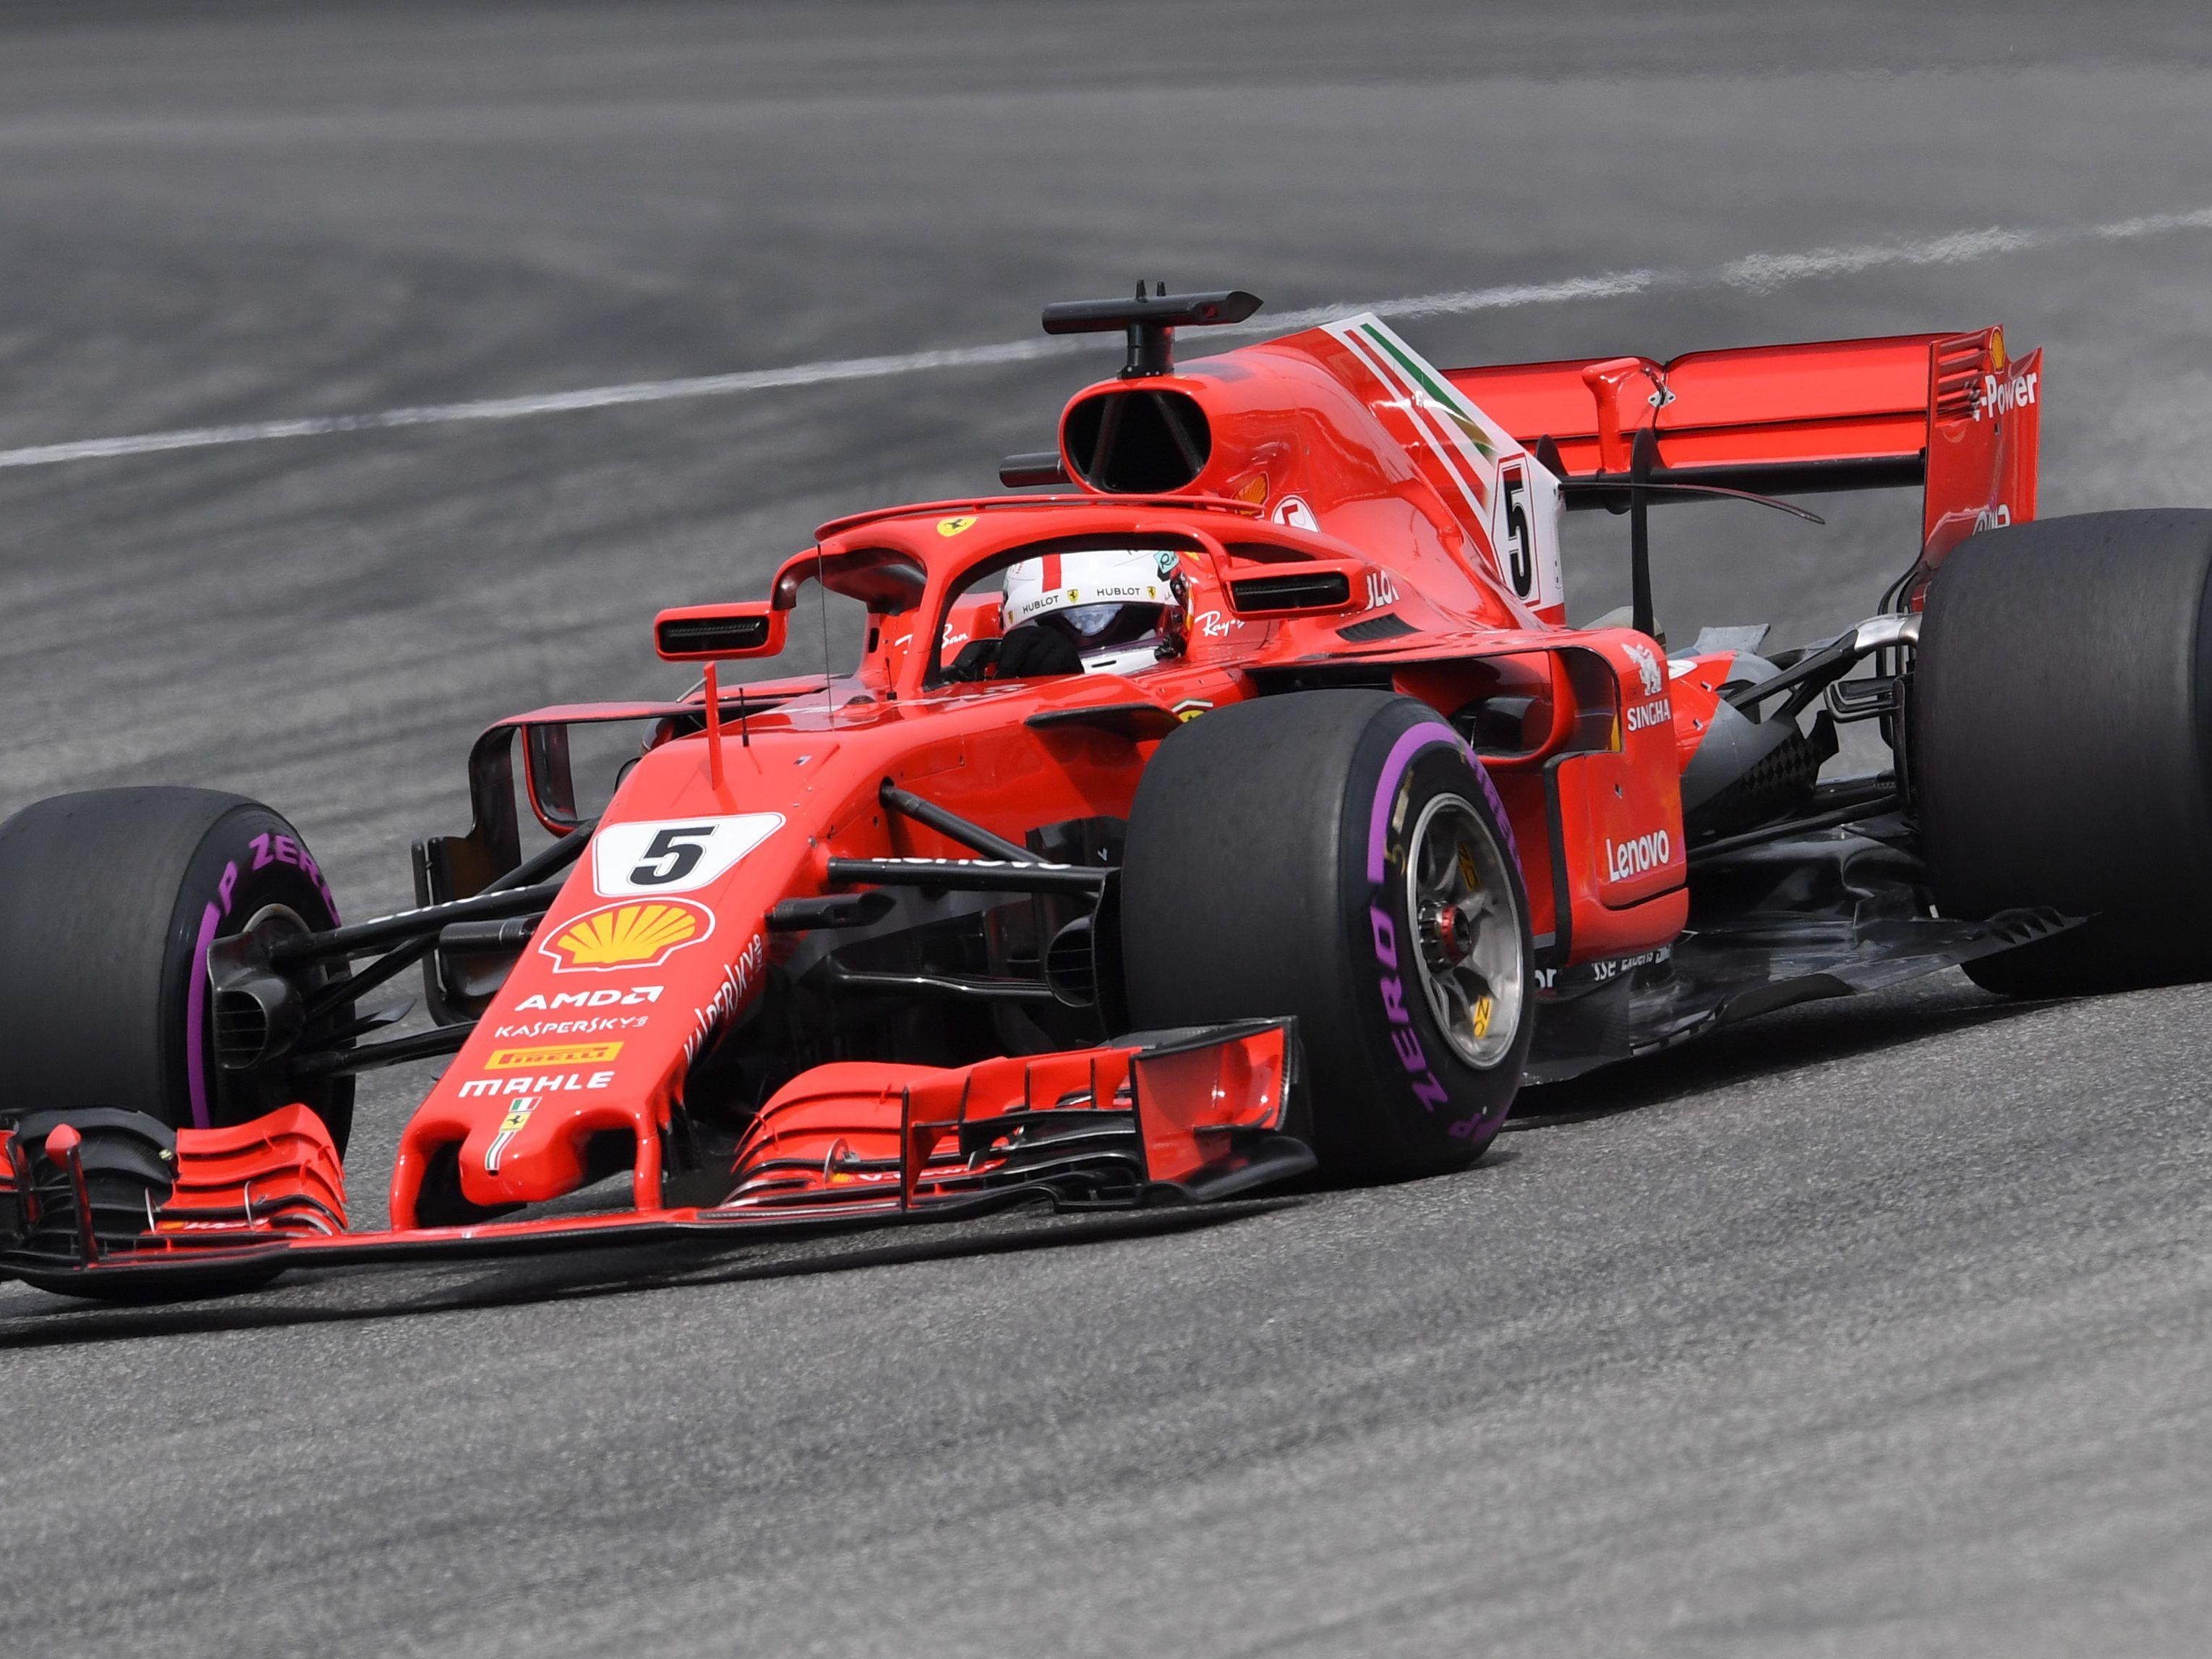 Vettel kracht in die Mauer! Hamiltons Sensation